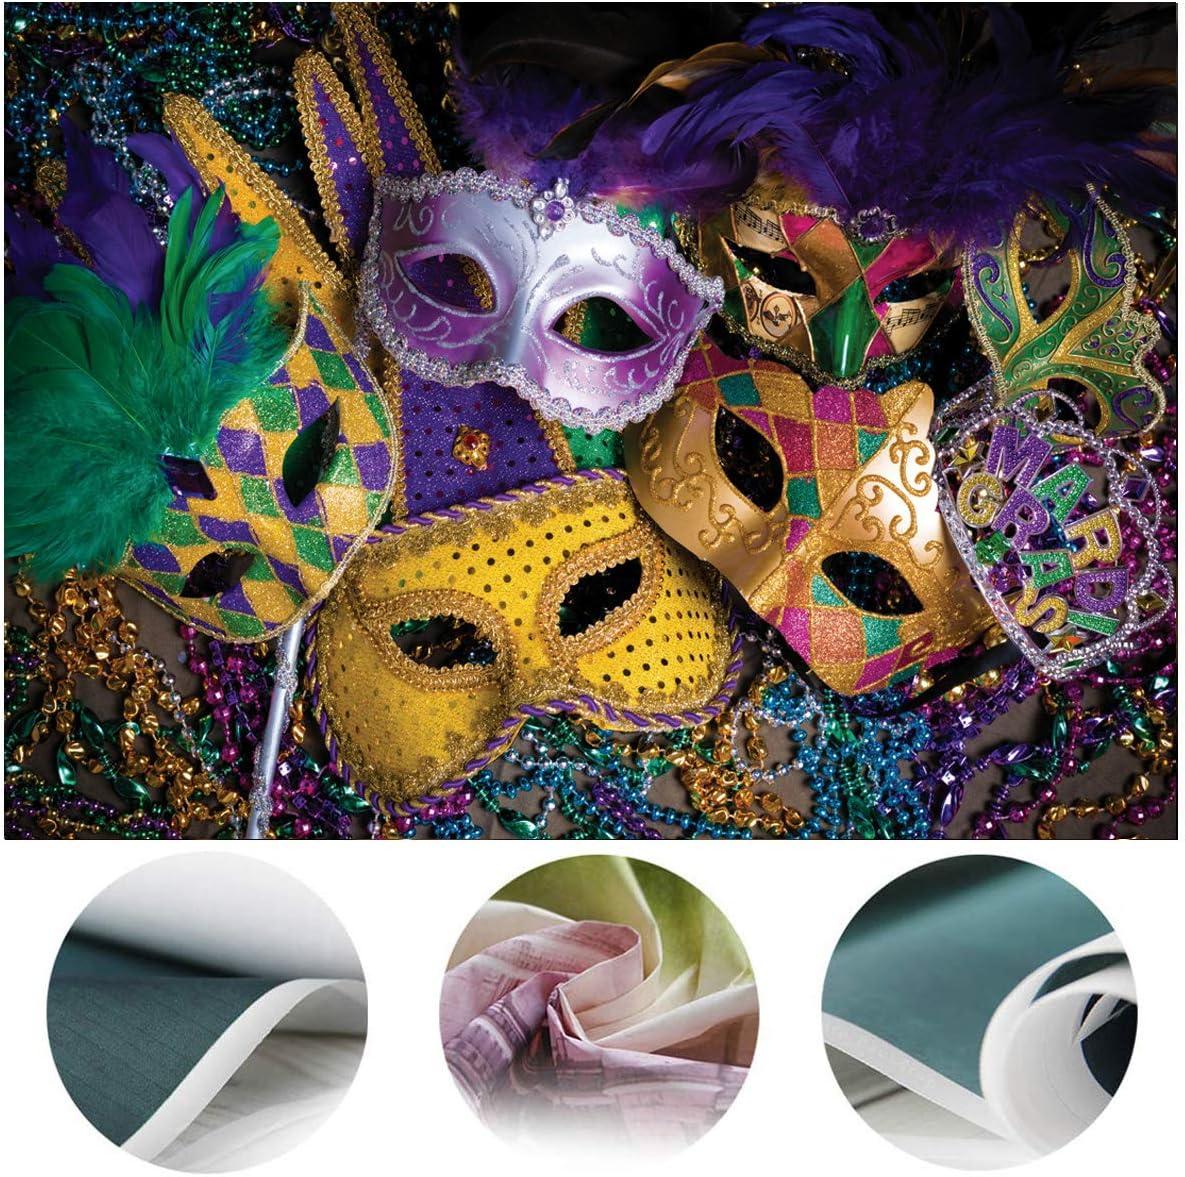 Party Bird Mardi Gras Colors Wand Masquerade Party Mask